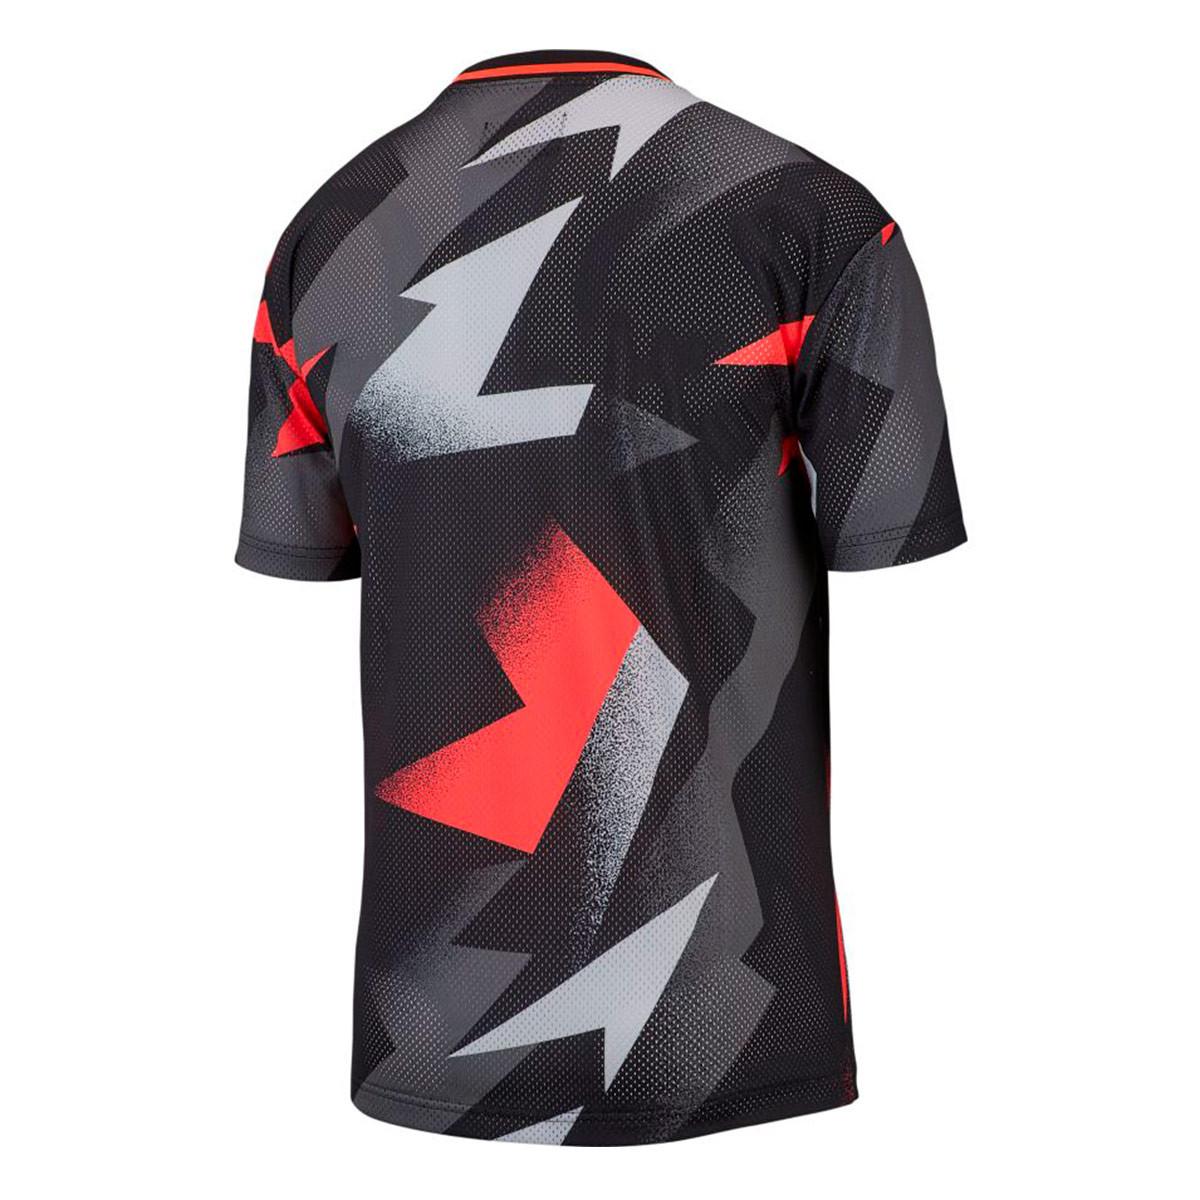 super popular 1cb1c 18b45 Nike Paris Saint-Germain Jordan Mesh 2019-2020 Jersey